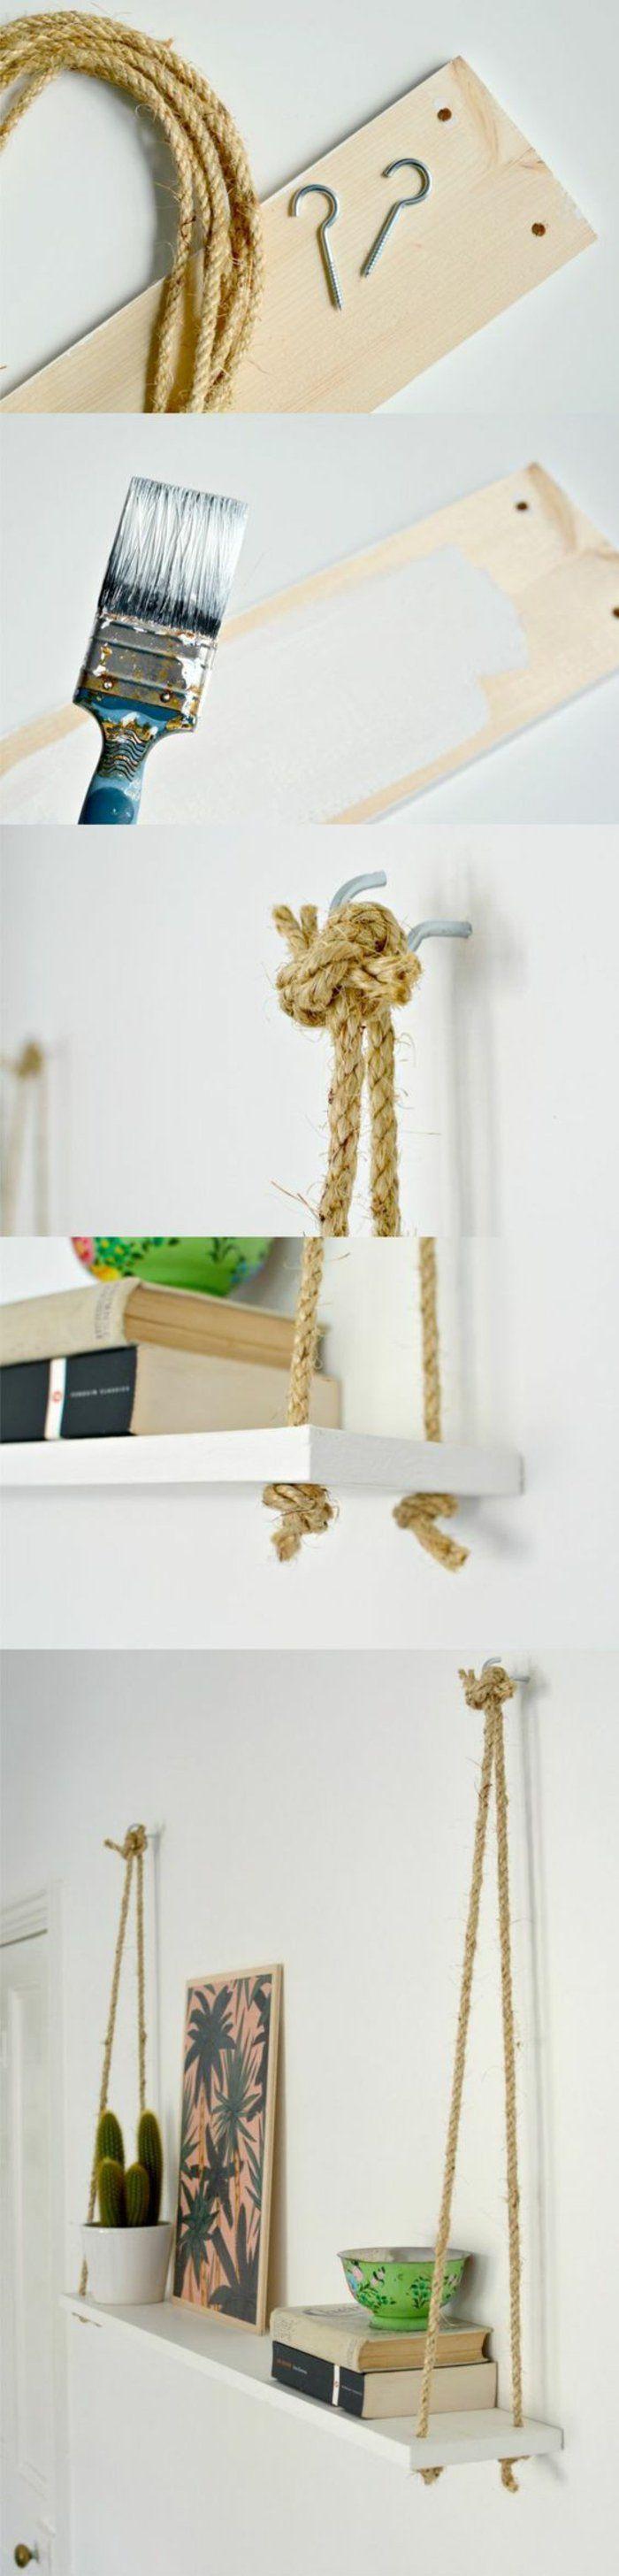 13 wandregal holz seile hängende regale diy farbe b+cher bild pdlanzen